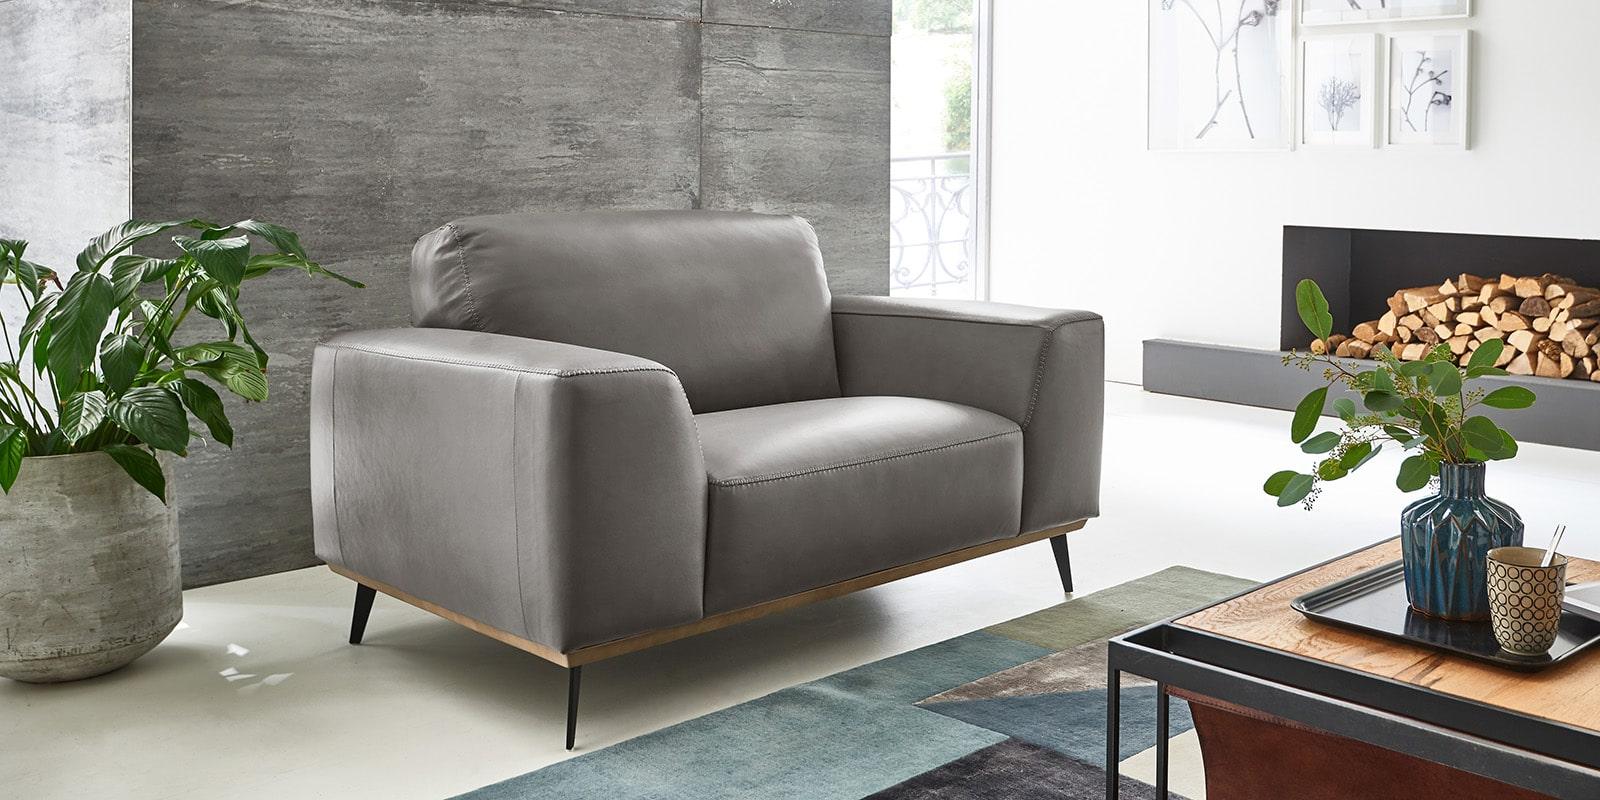 Moebella24 - 1,5-Sitzer - Sessel - Sofa - Barcelona - Leder - Grau - Skandinavisches - Design - Punto - cavallo - Nähte - Elegante - Füße